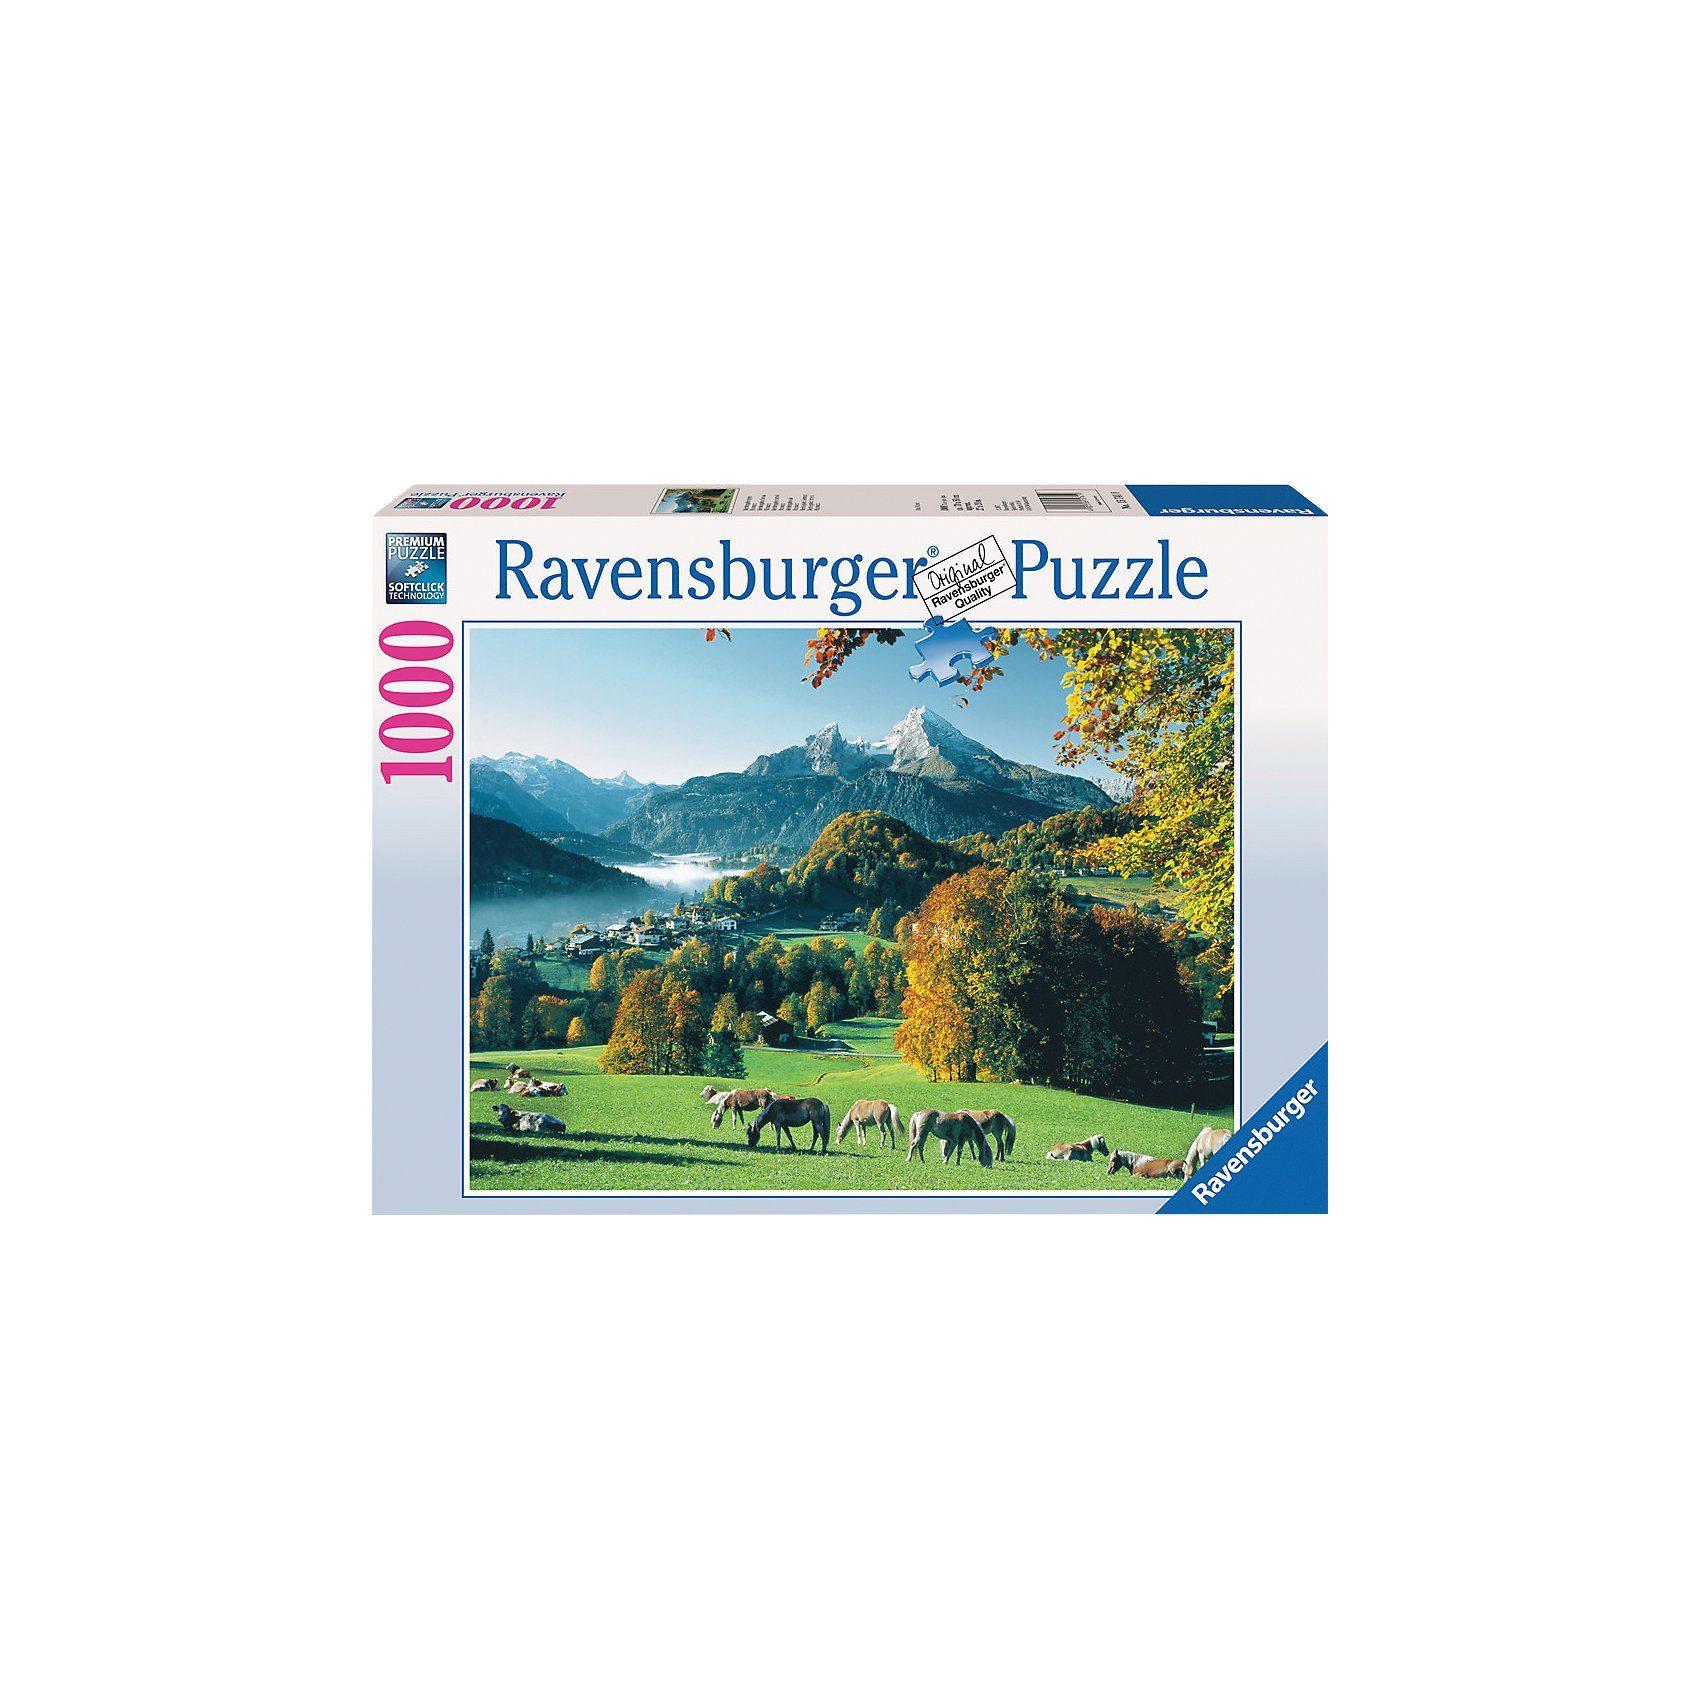 Ravensburger Puzzle 1000 Teile Berchtesgaden gegen Watzmann